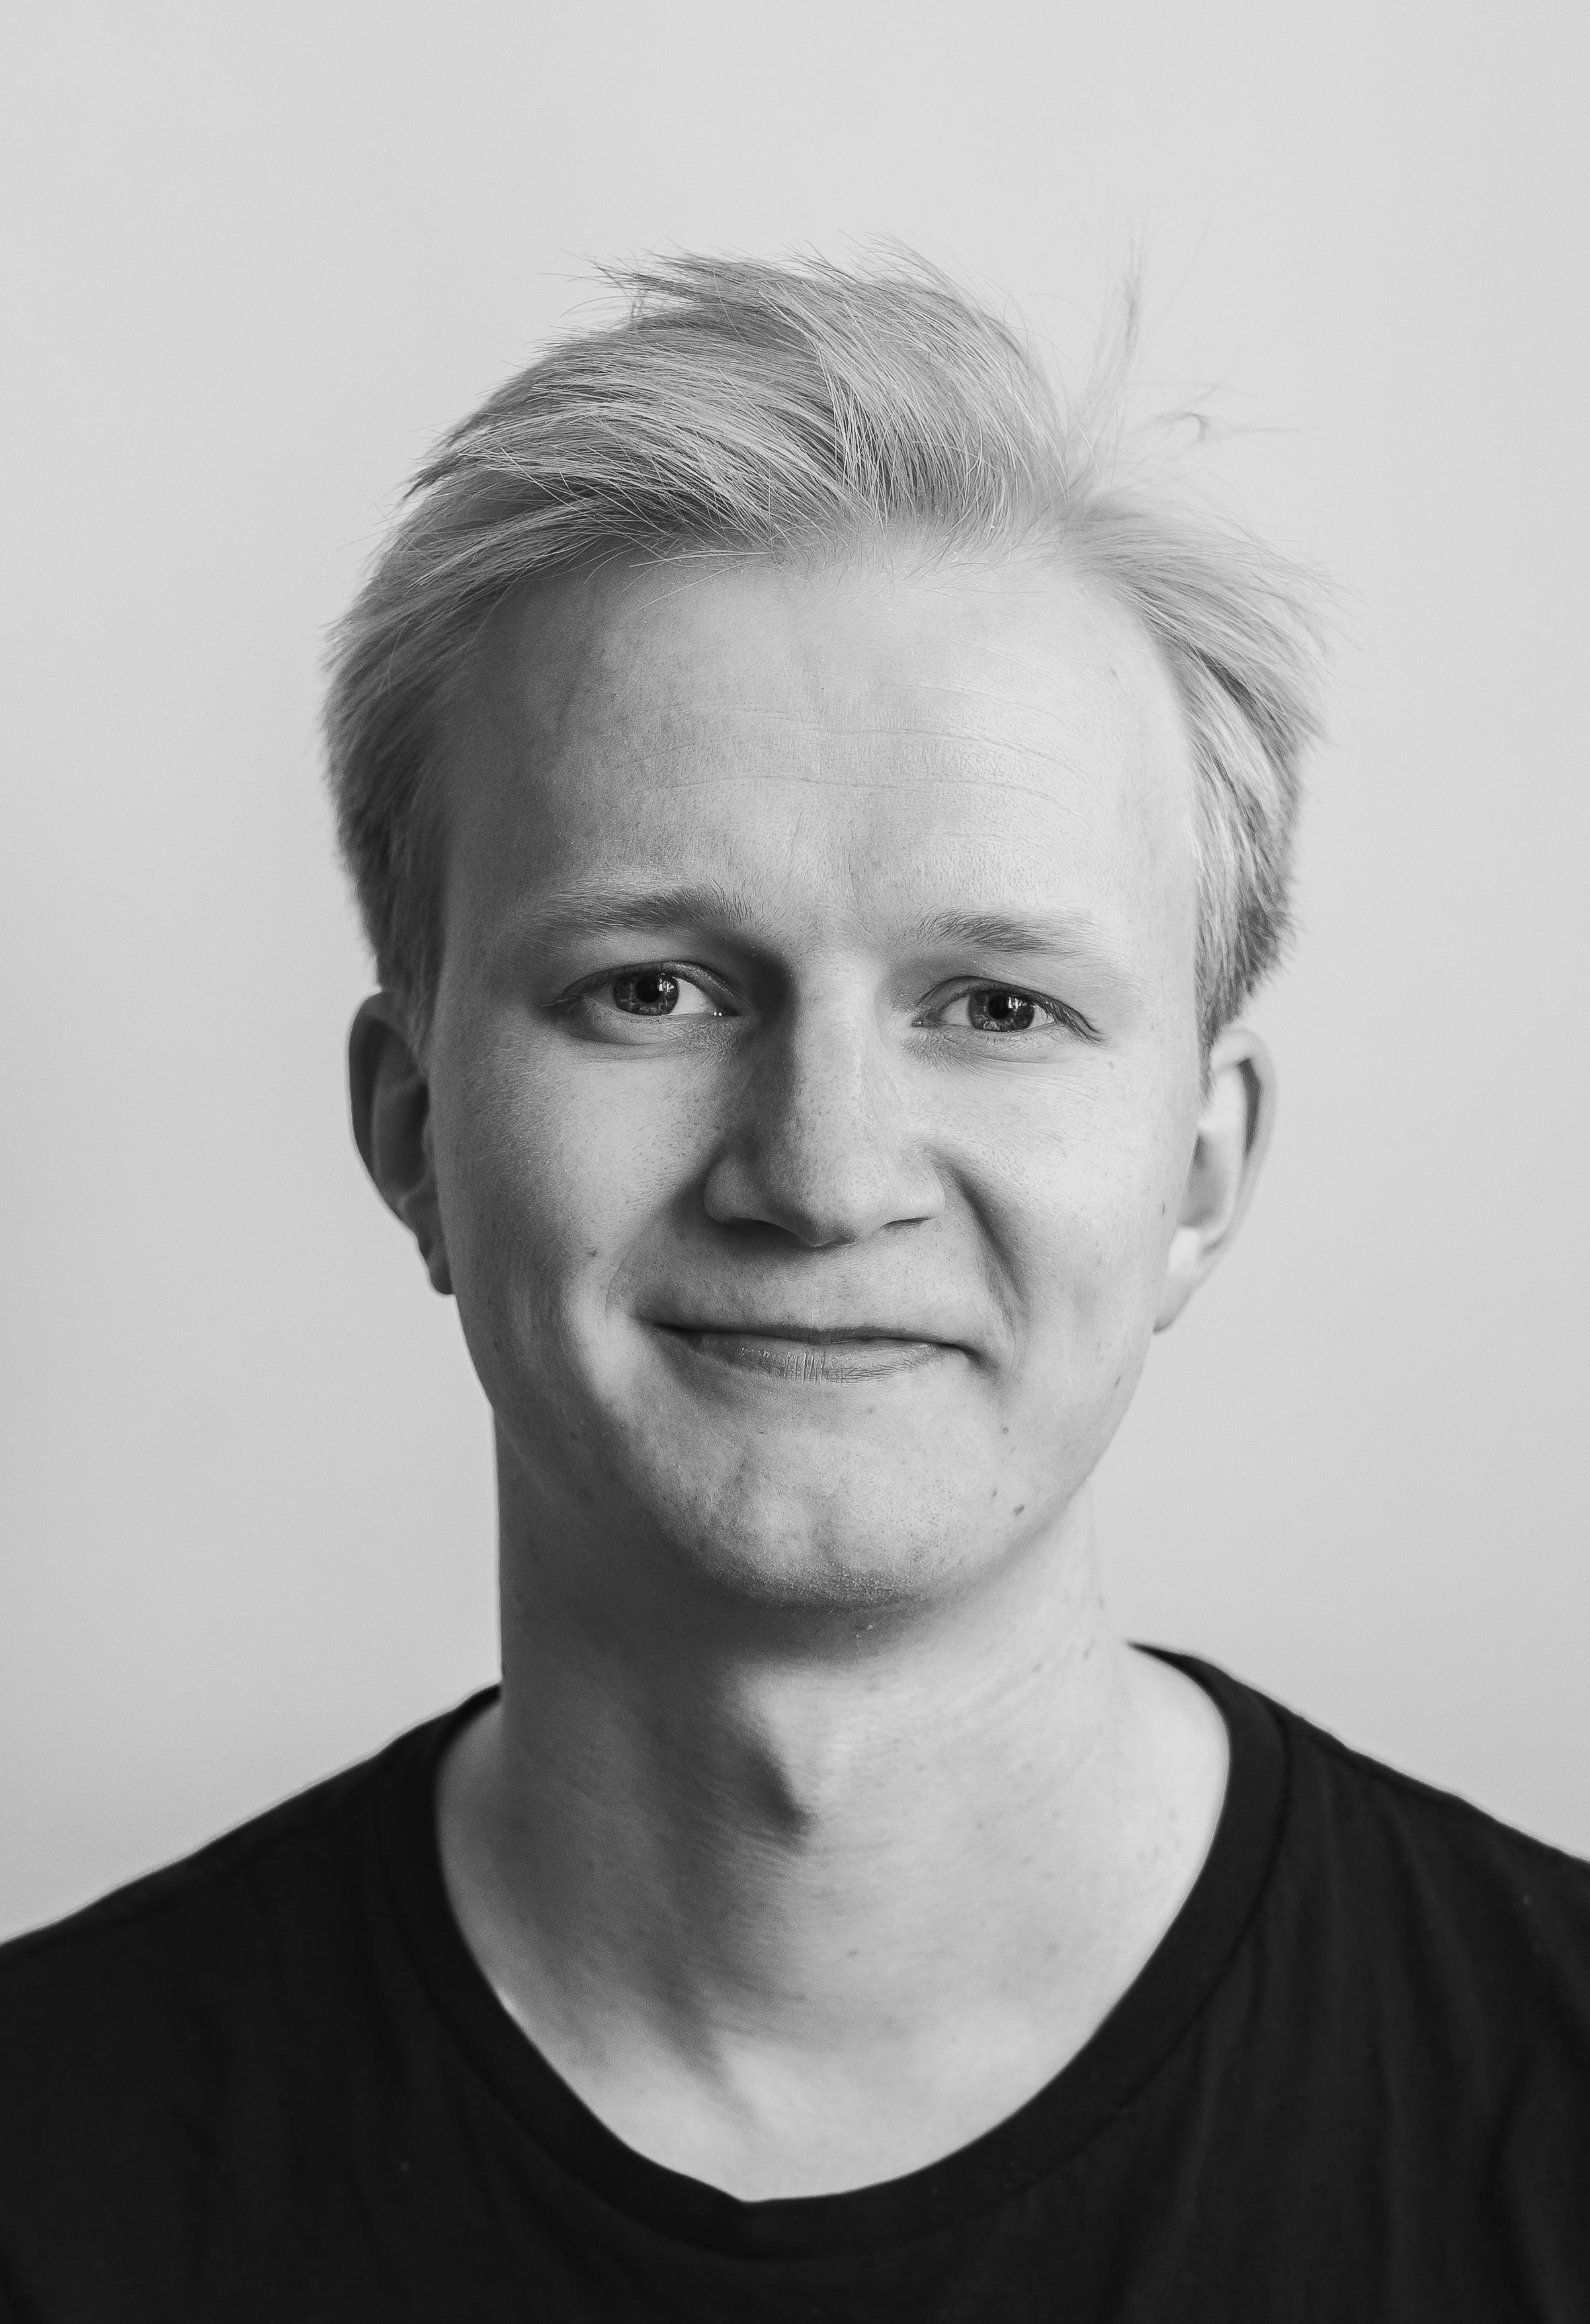 Musikkteaterhøyskolen - Bendik Hvoslef-Eide